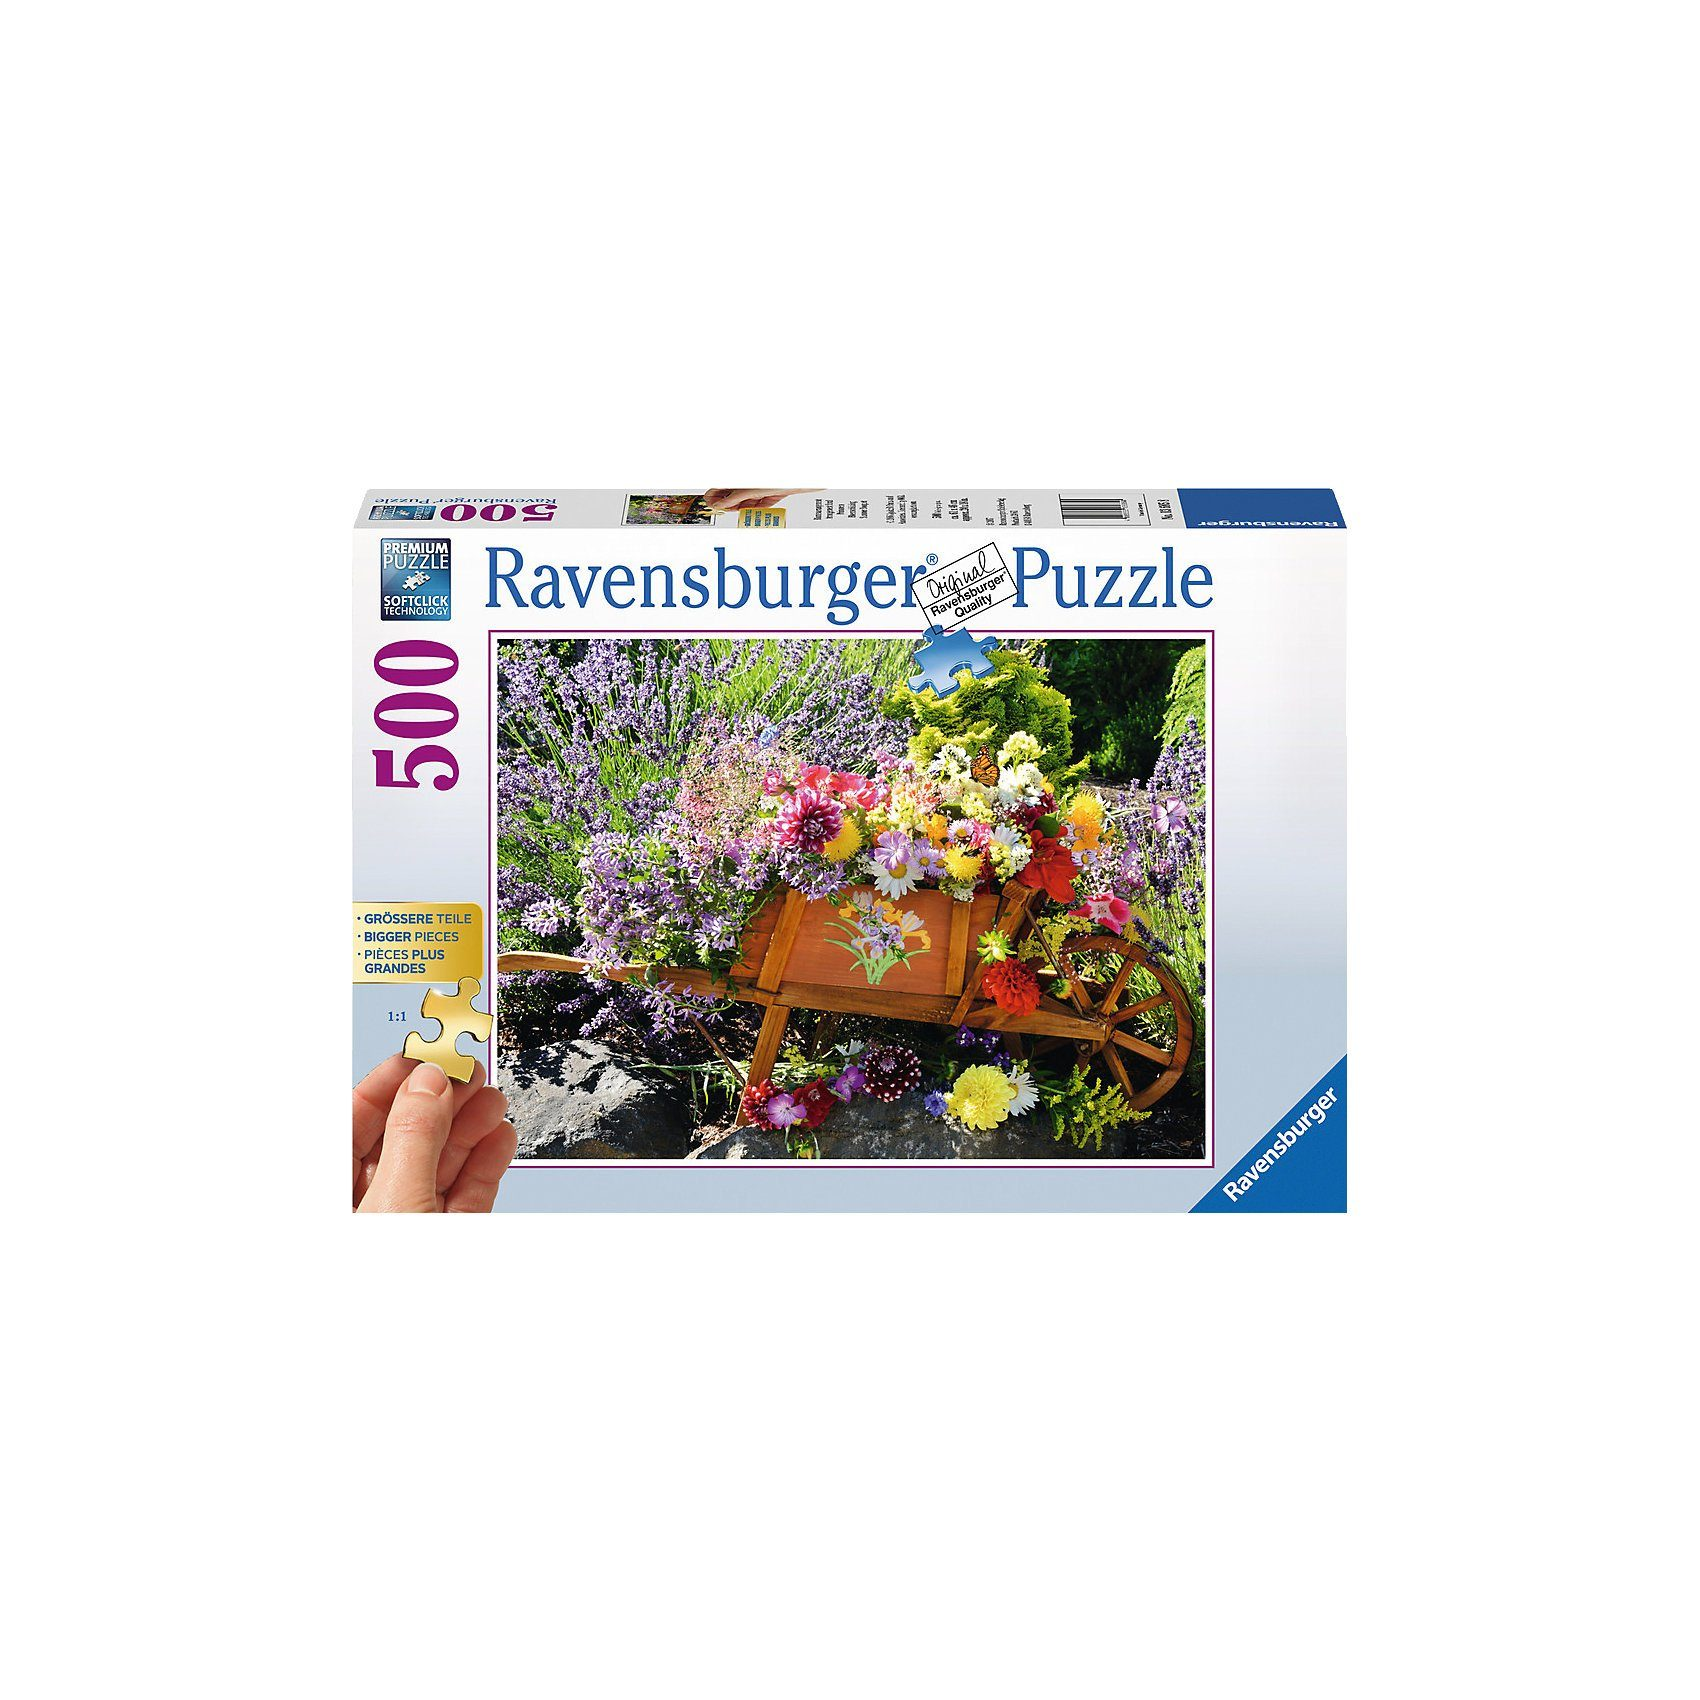 Ravensburger Blumenarrangement 300/500 Teile Gold Edition